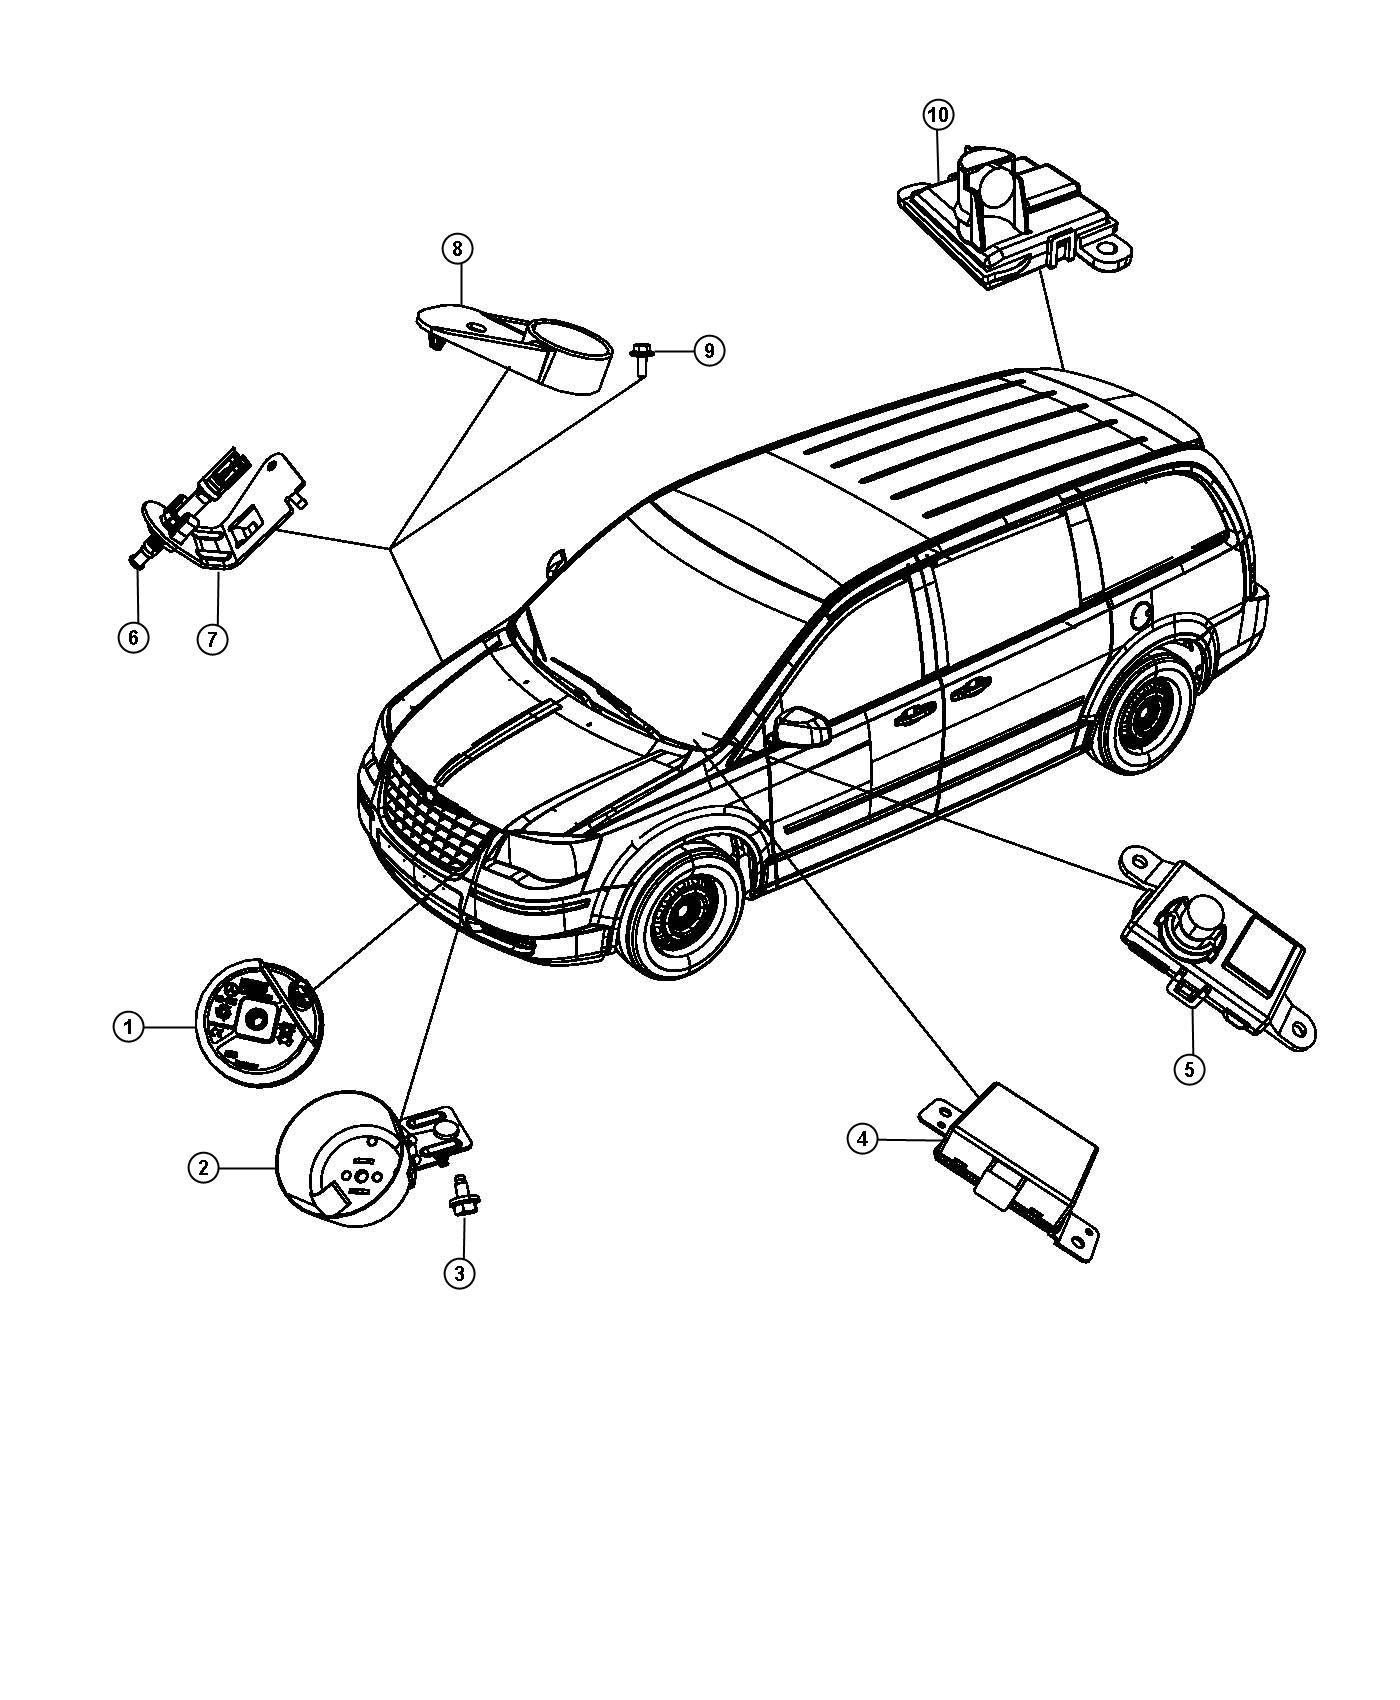 2012 Dodge Grand Caravan Siren Alarm System